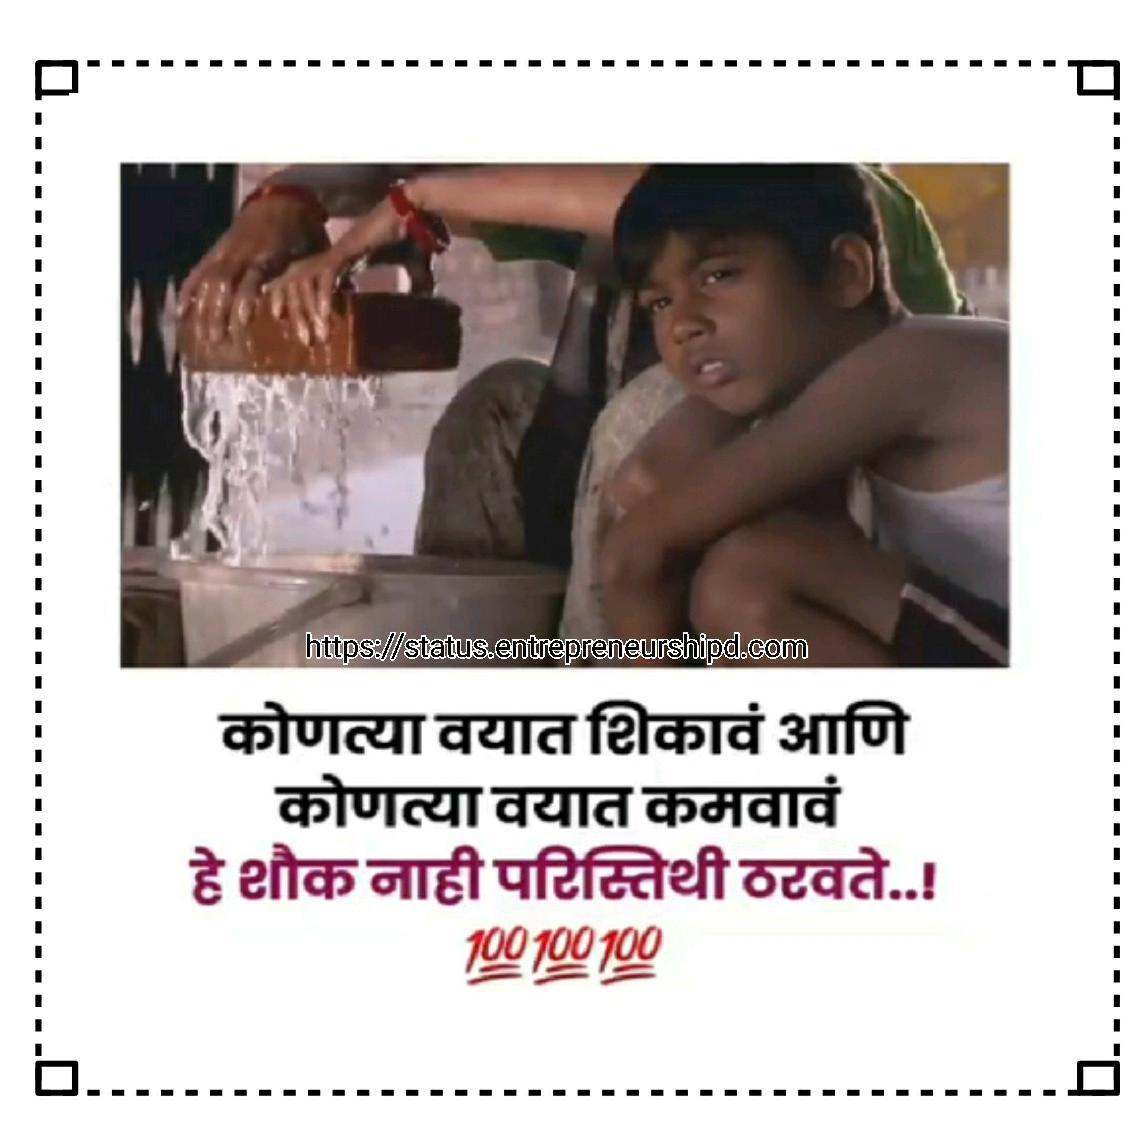 Marathi attitude status for instagram Marathi attitude status for friends Marathi attitude status family